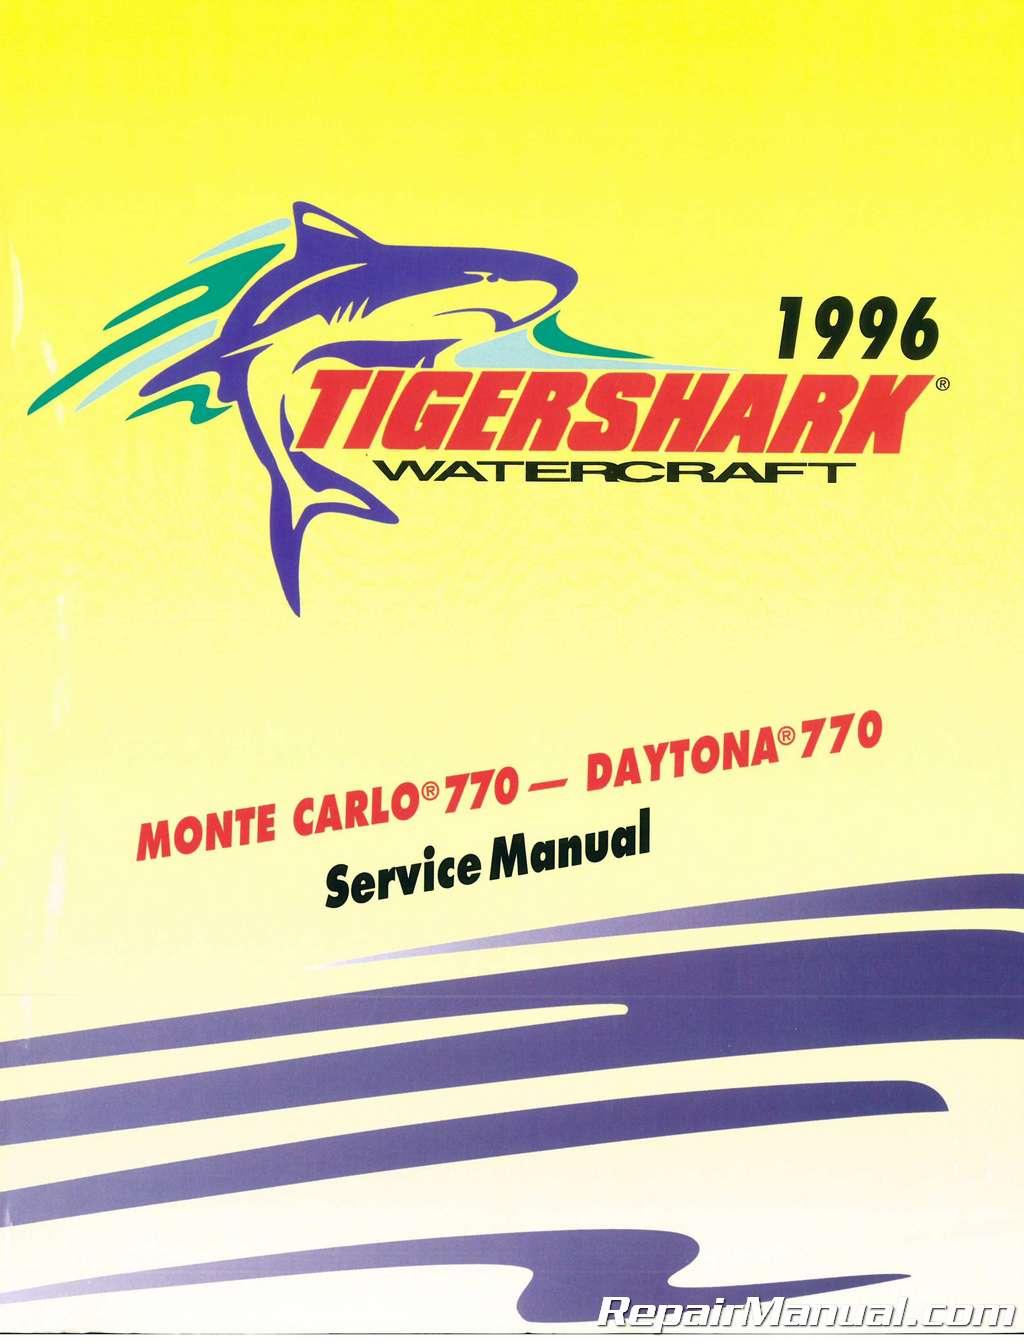 tigershark 1996 monte carlo 770 daytona 770 service manual rh repairmanual com 1990 Monte Carlo 1990 Monte Carlo